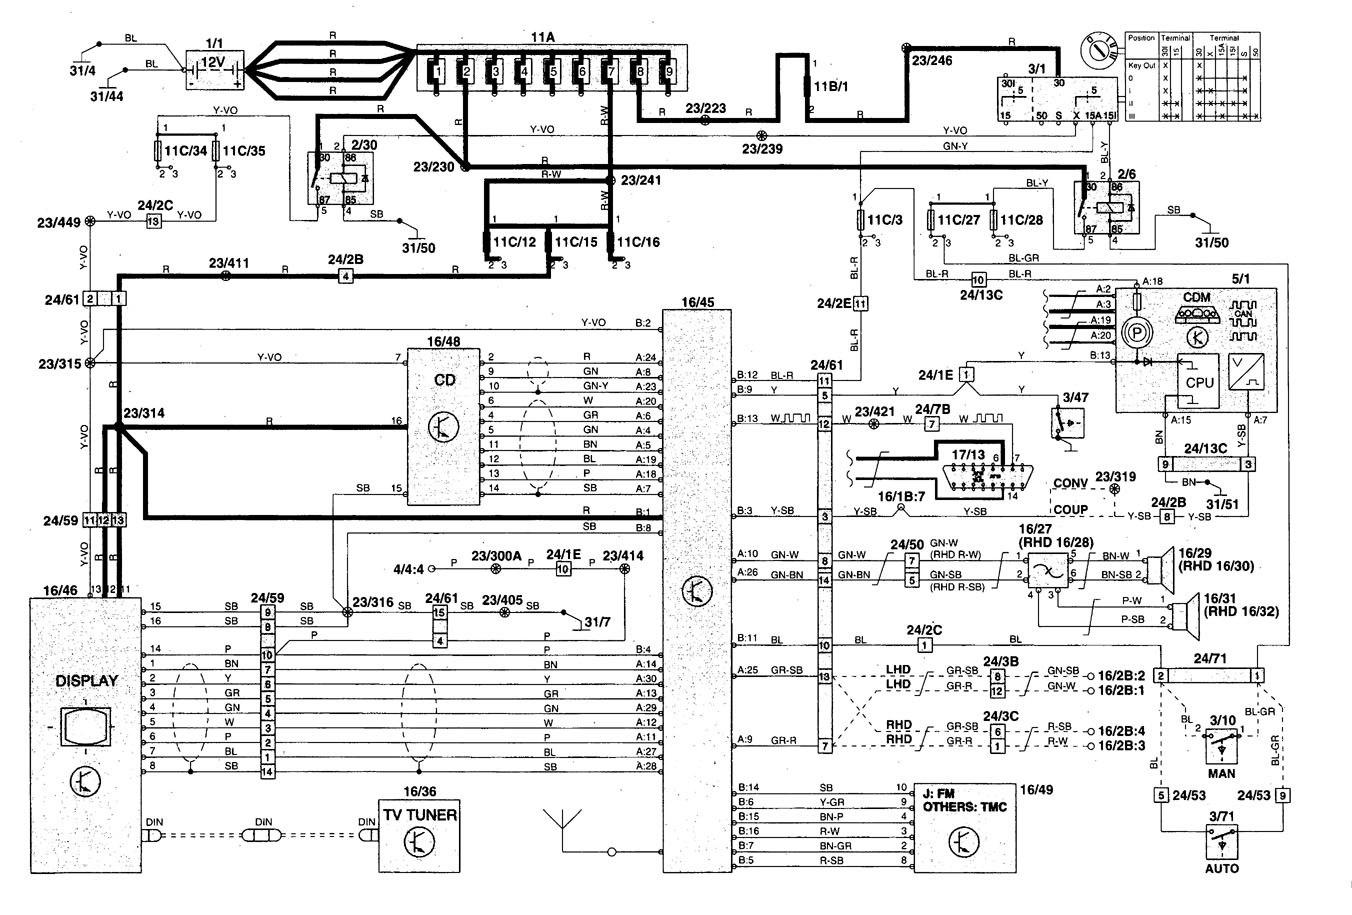 Volvo Navigation Wiring Diagram : Volvo navigation wiring diagram library